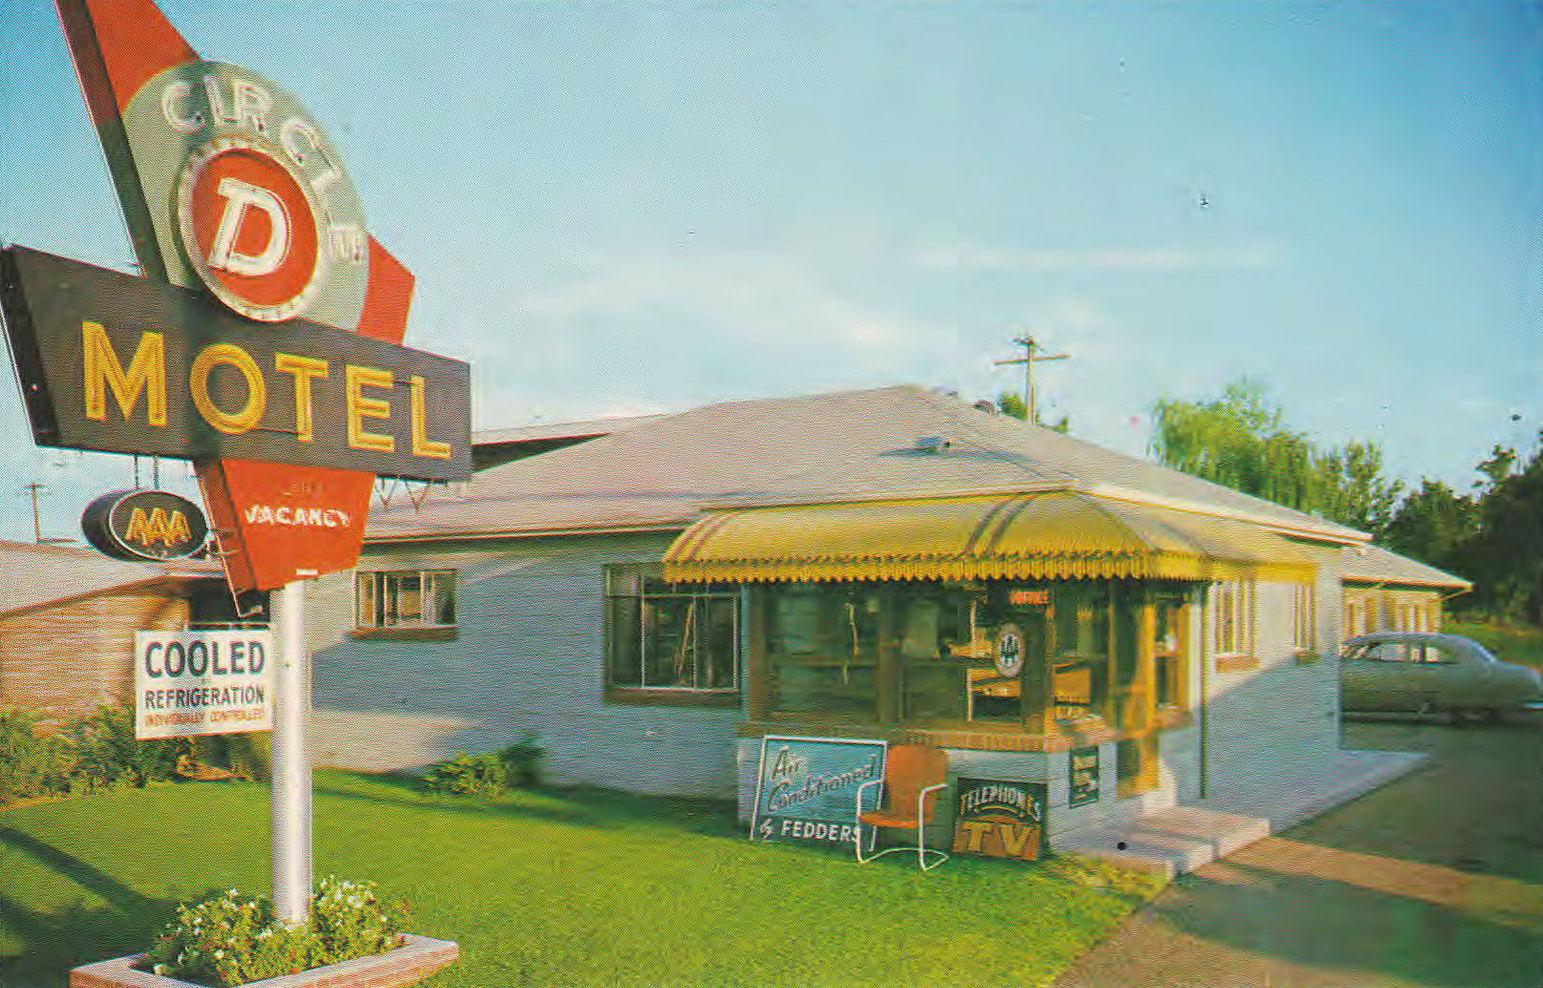 colfax avenue circle d motel